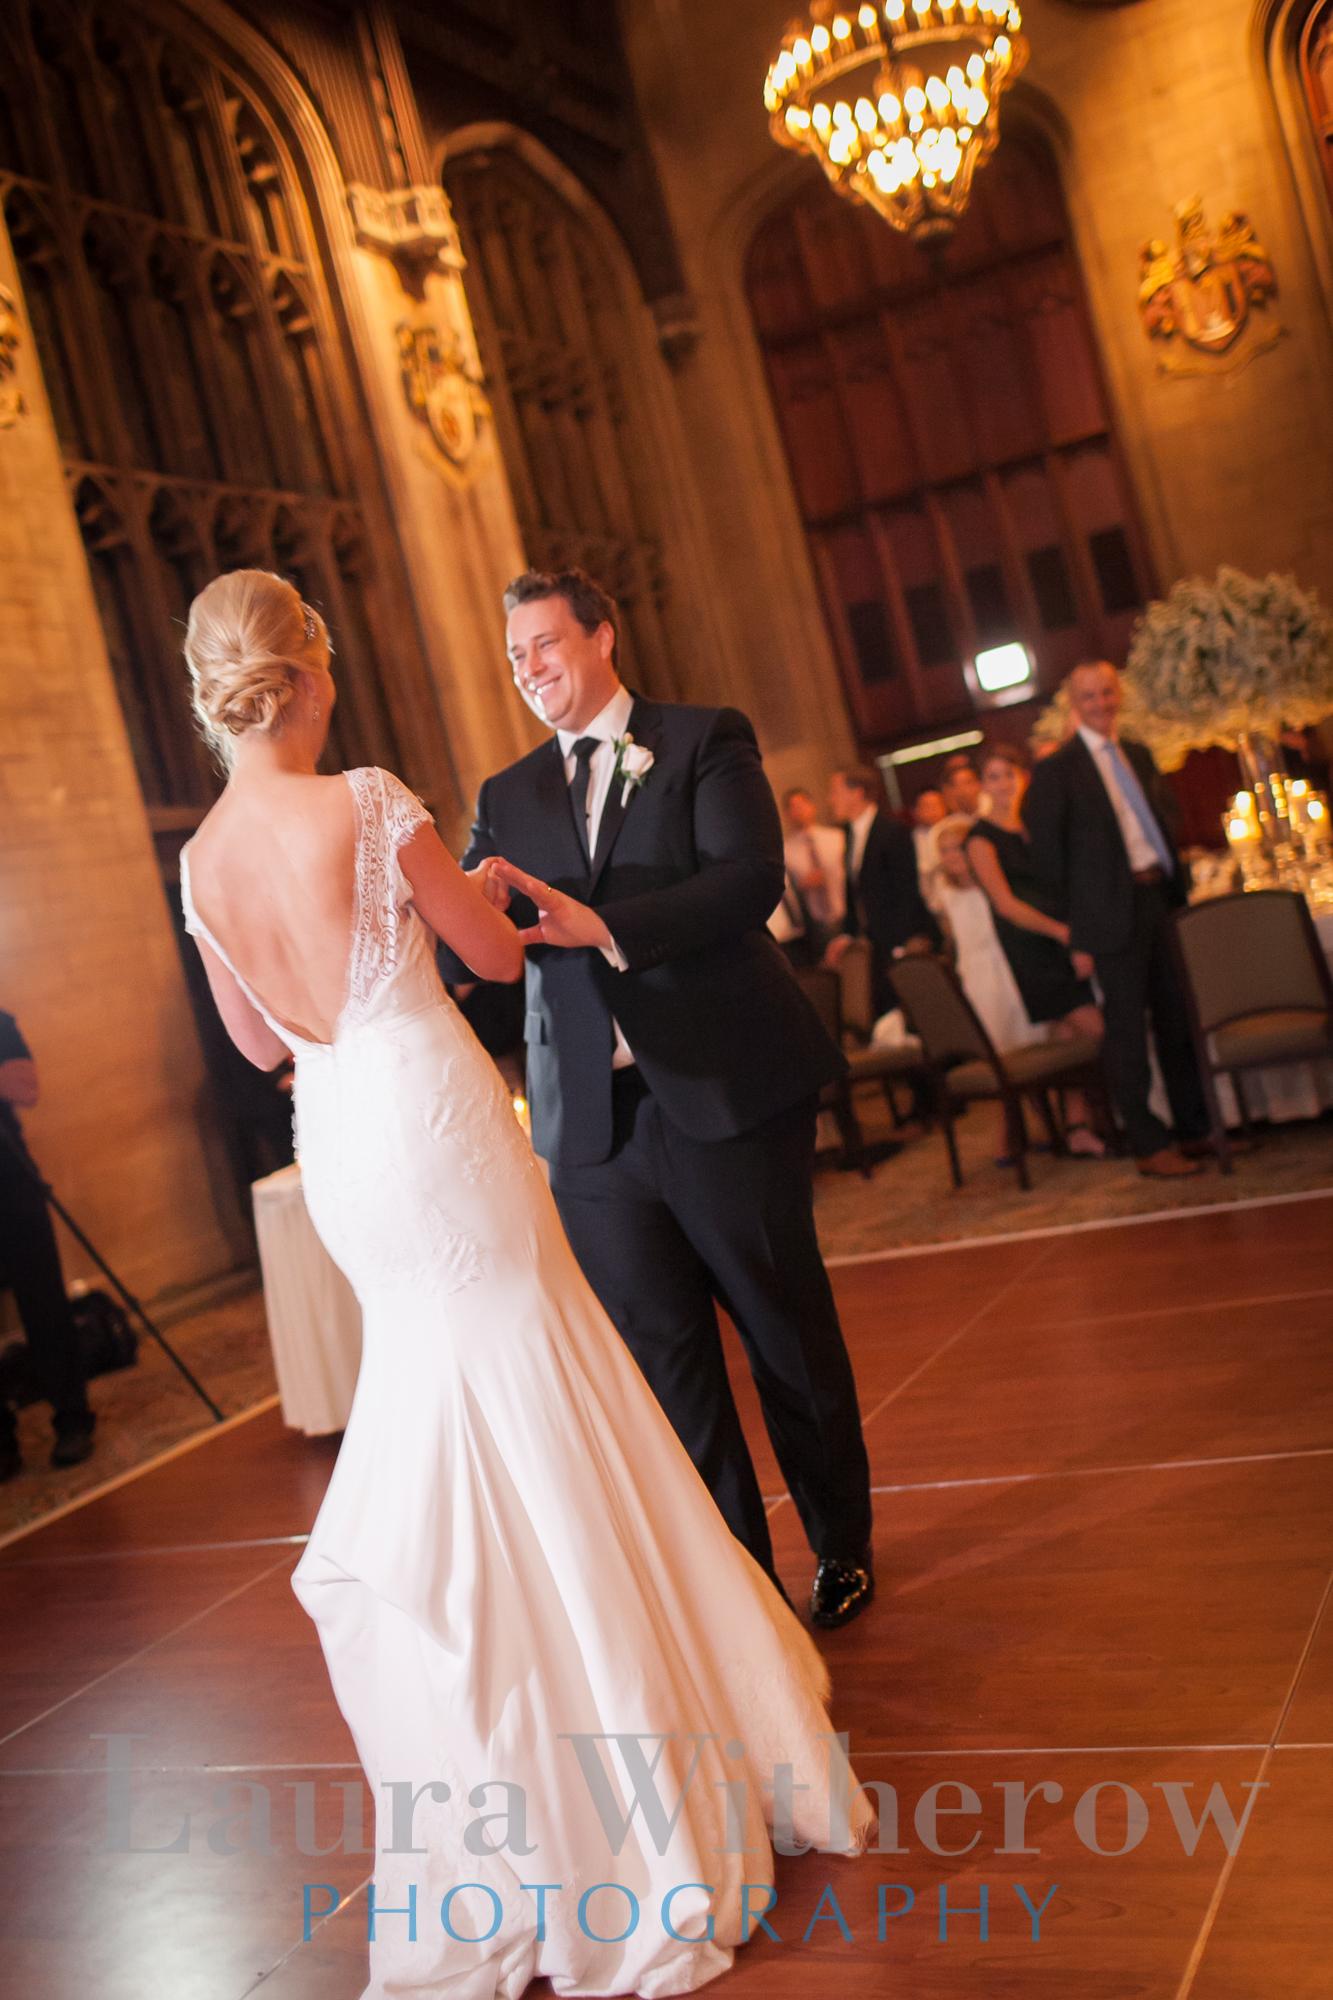 weddings-photos-university-club-chicago.jpg